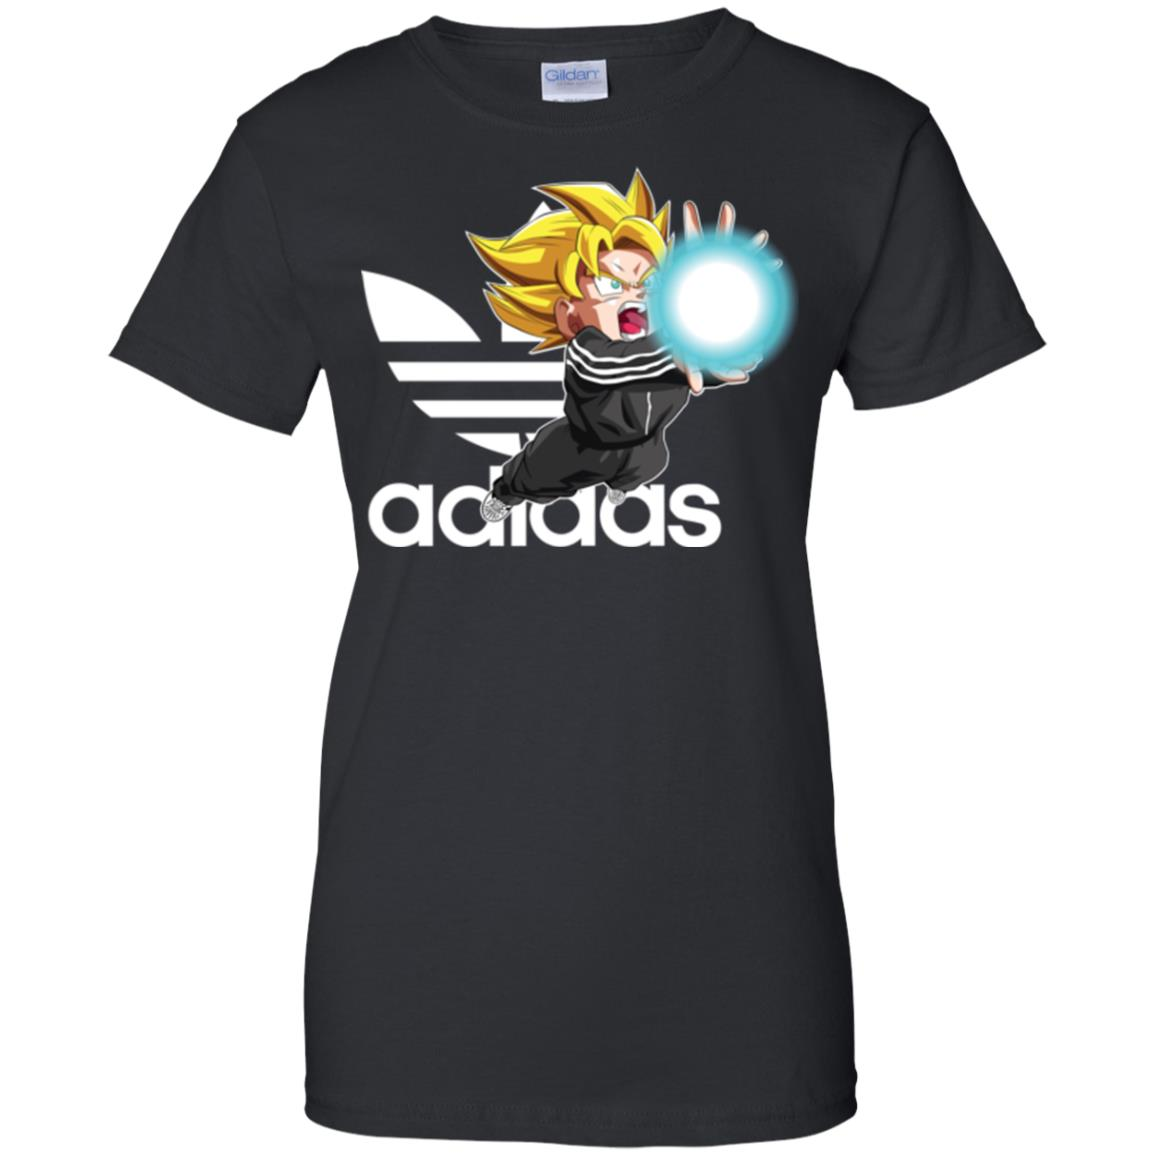 image 270px Goku Adidas Mashup T Shirt, Hoodies, Tank Top Available